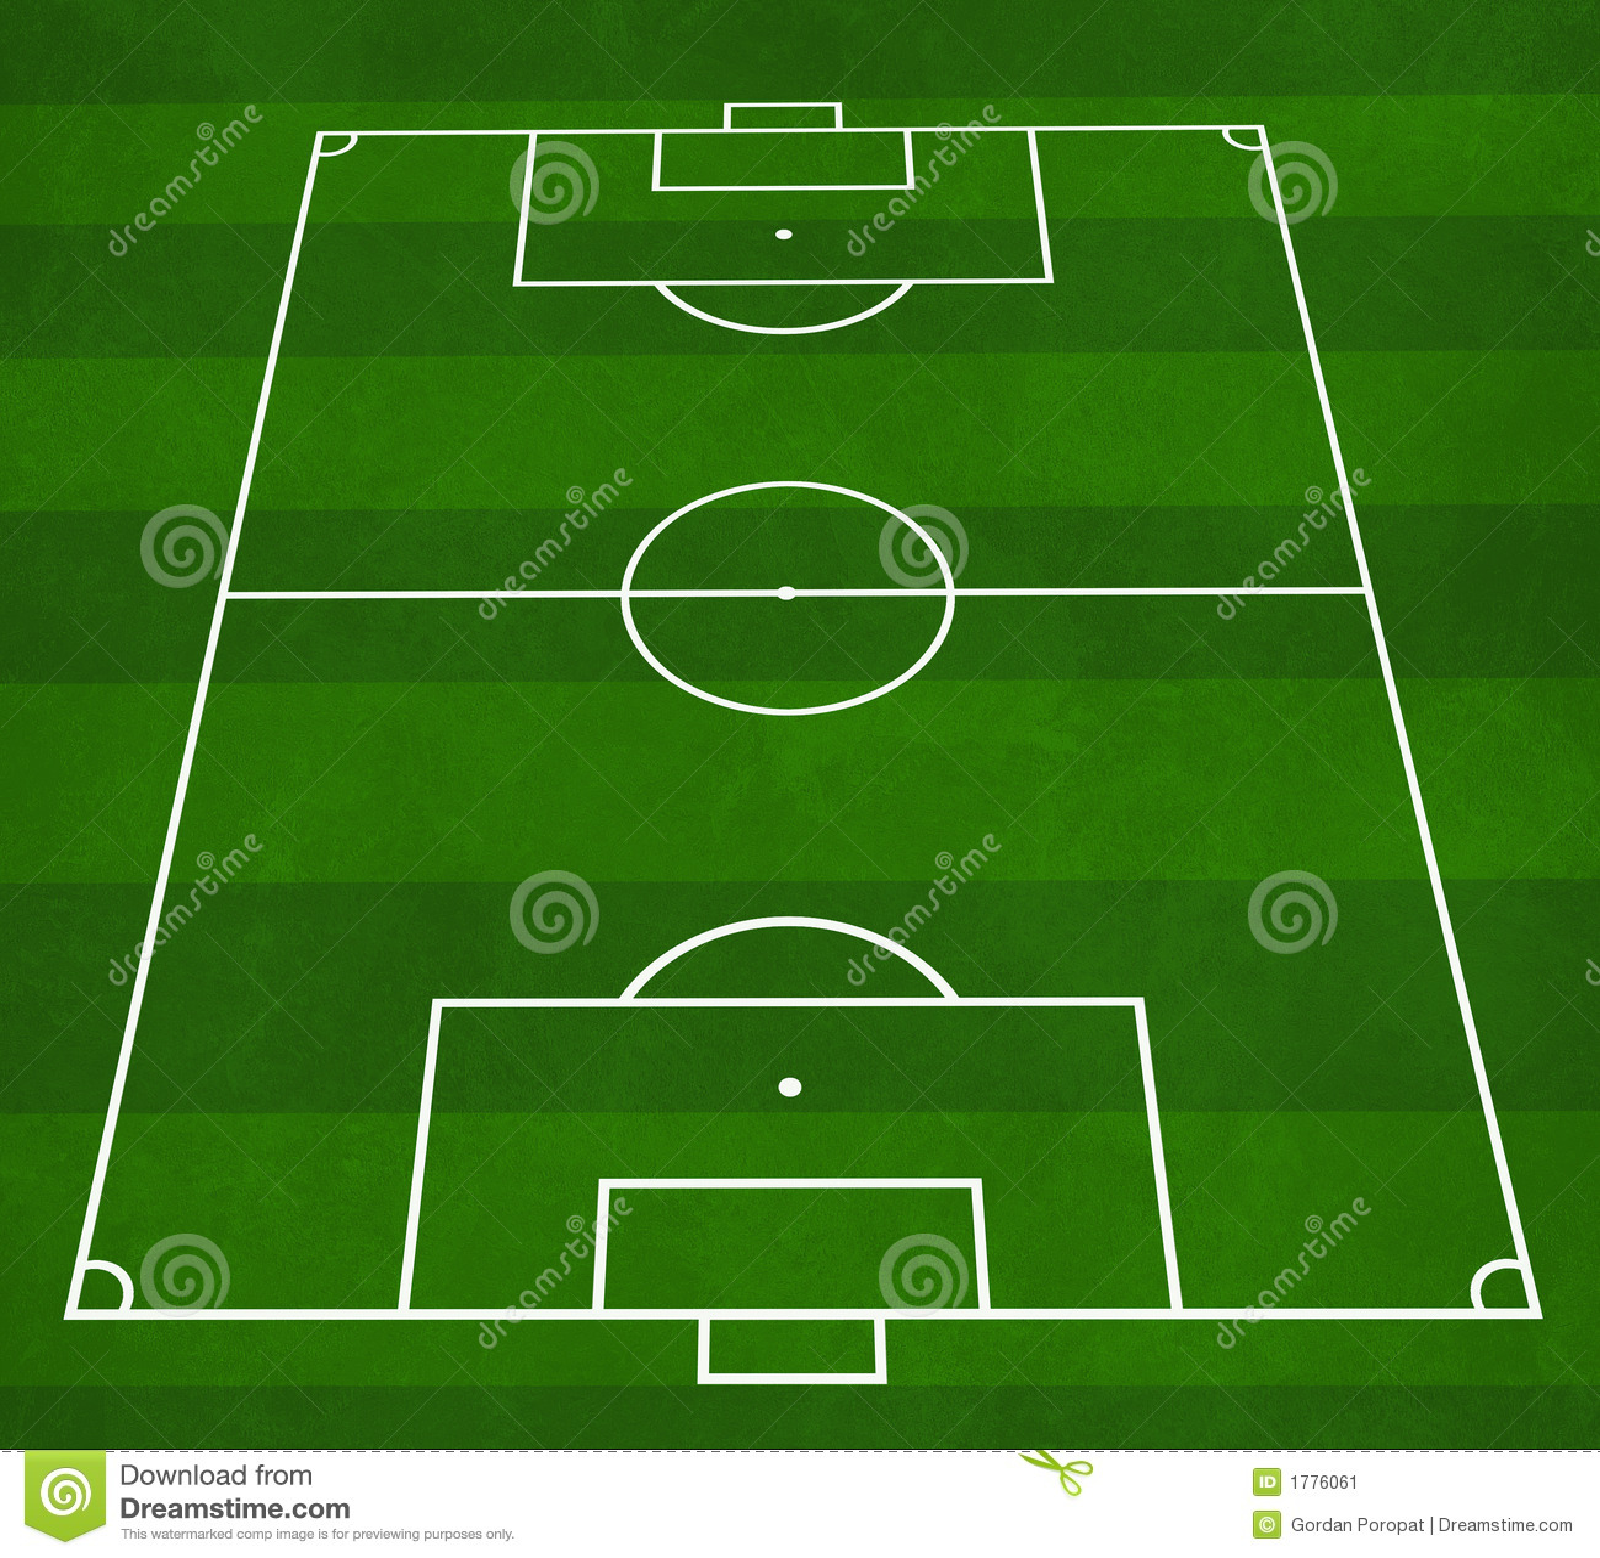 Smoła futbolu